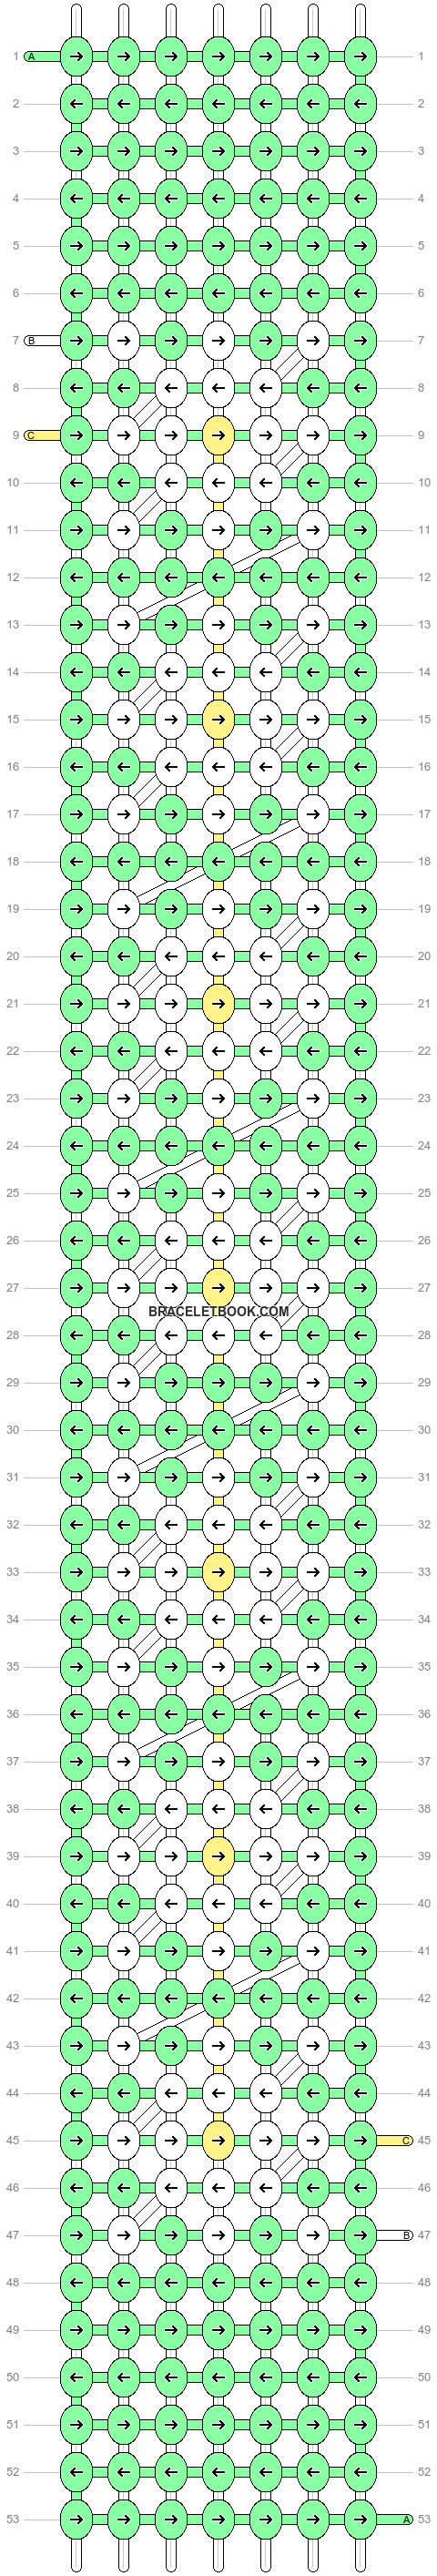 Alpha pattern #20681 pattern